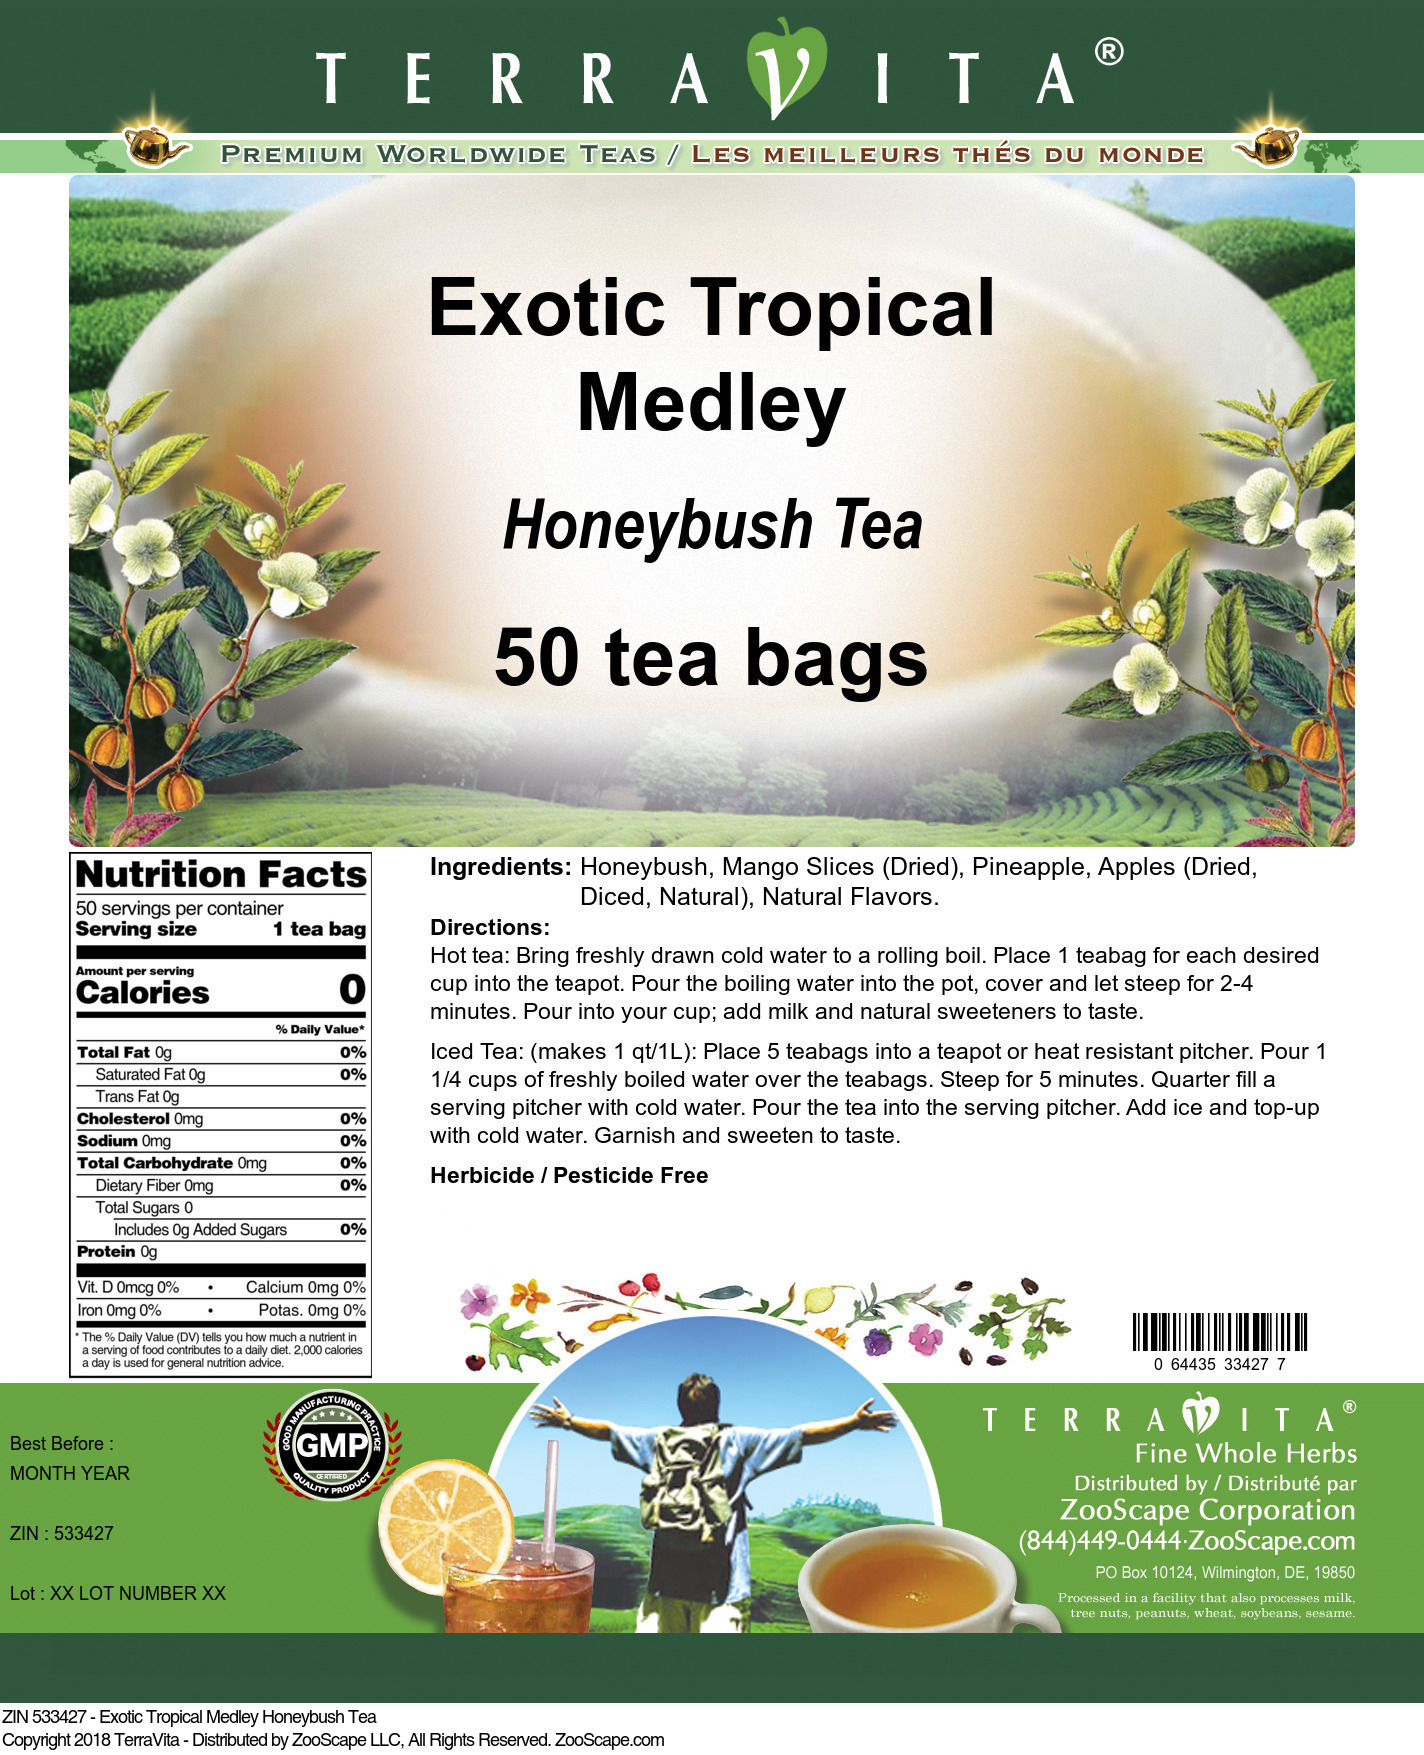 Exotic Tropical Medley Honeybush Tea